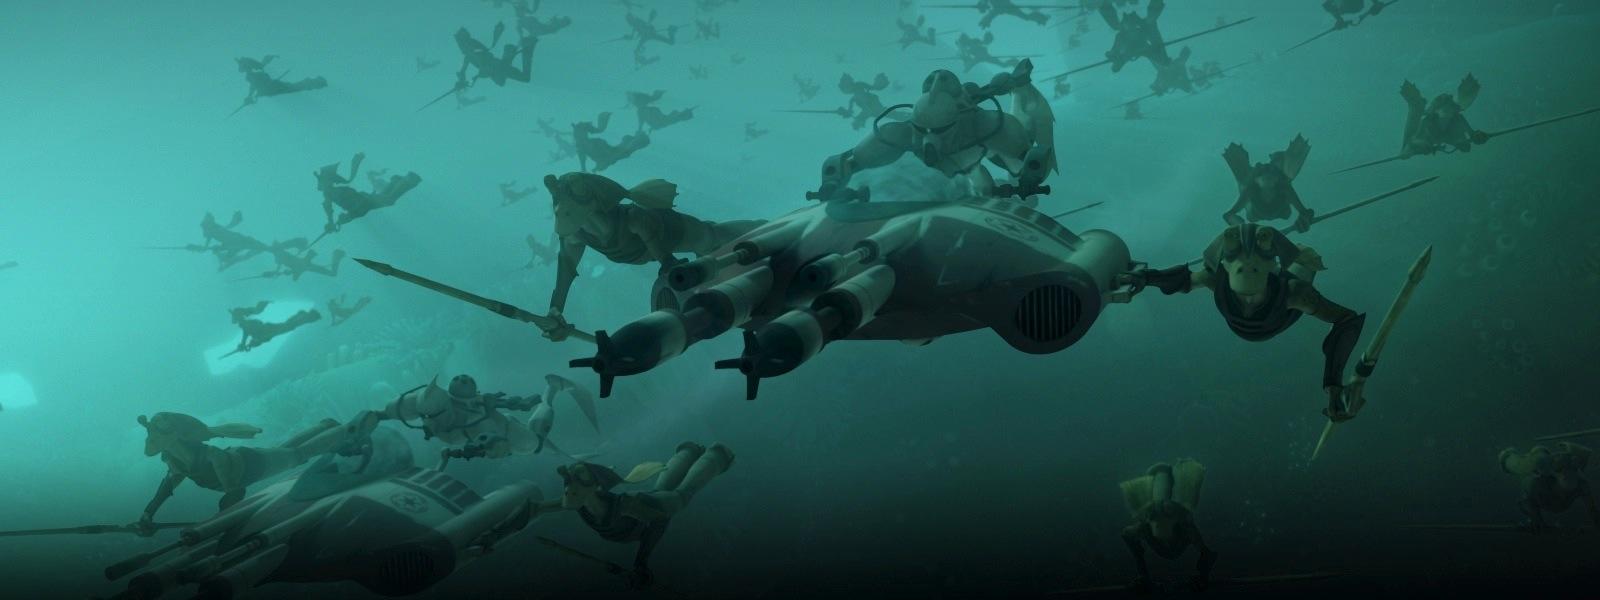 the armchair squid the clone wars gungan attack